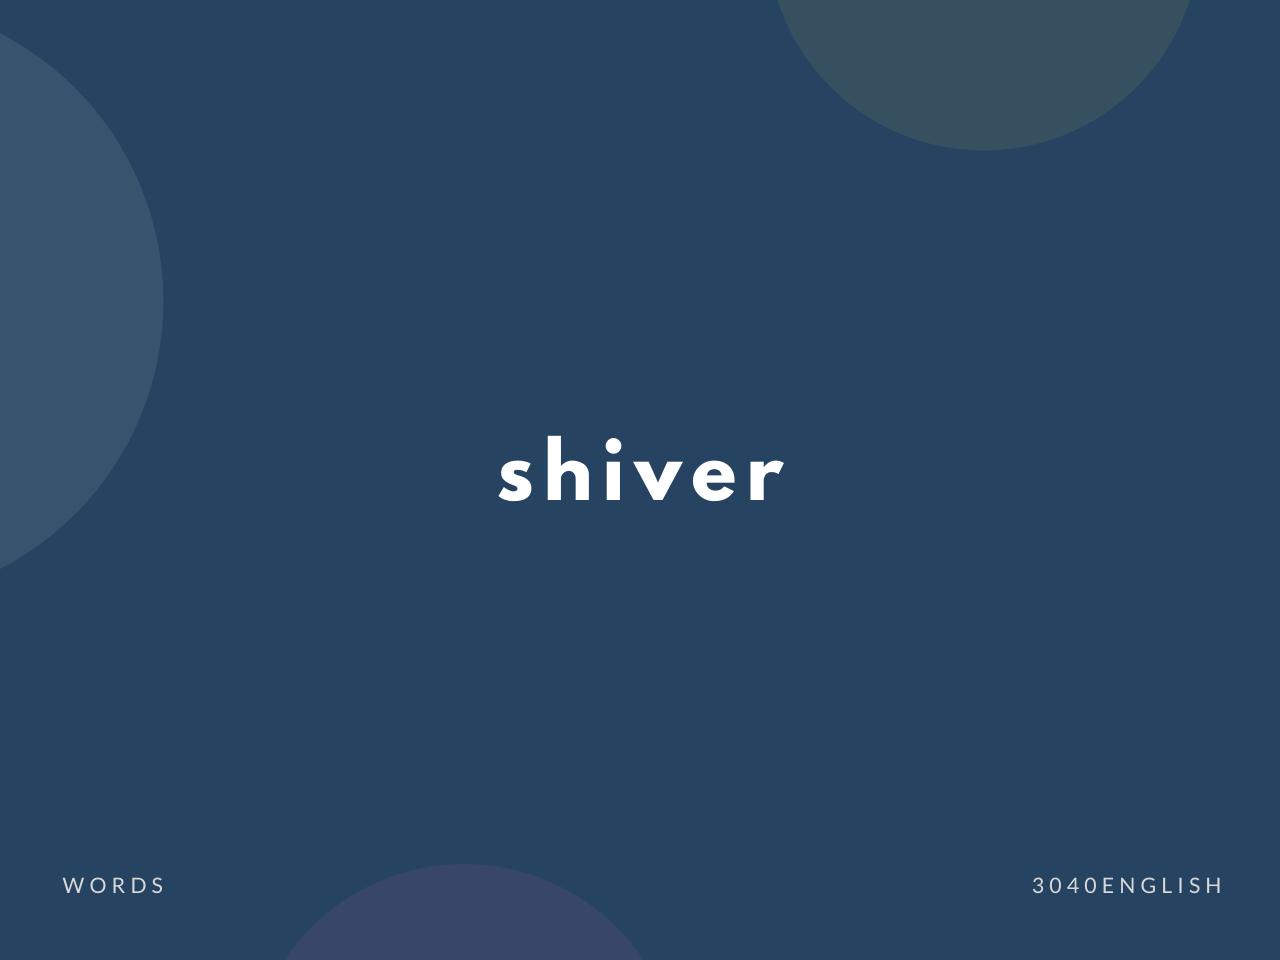 shiver の意味と簡単な使い方【音読用例文あり】